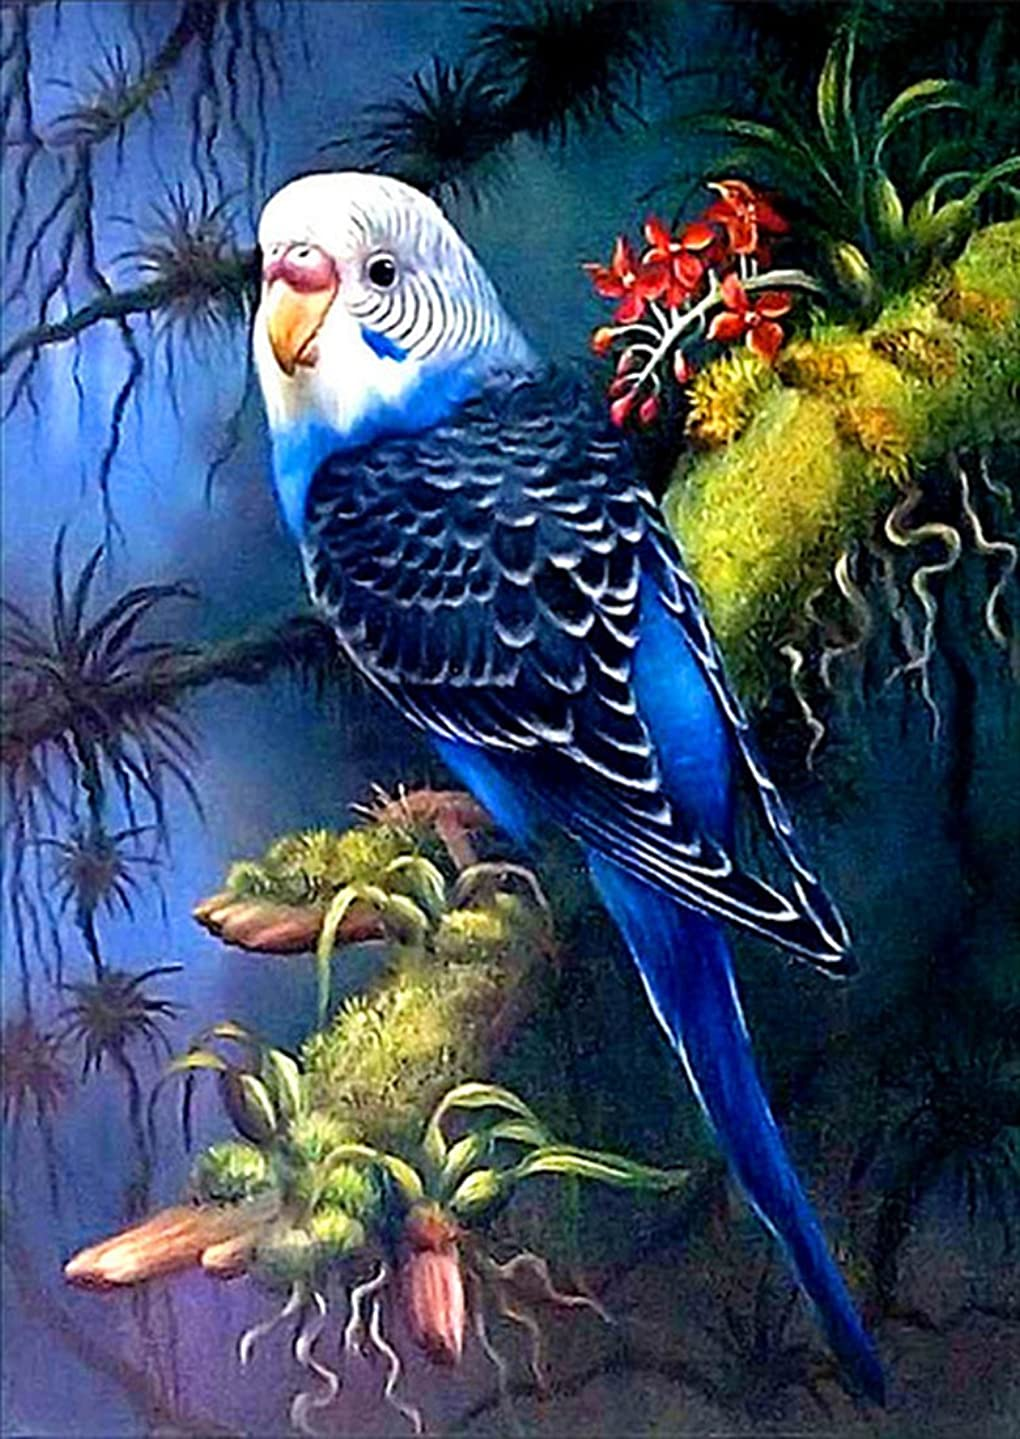 21secret 5D Diamond Diy Painting Full drill Handmade Forest Parrot Bird Cross Stitch Home Decor Embroidery Kit